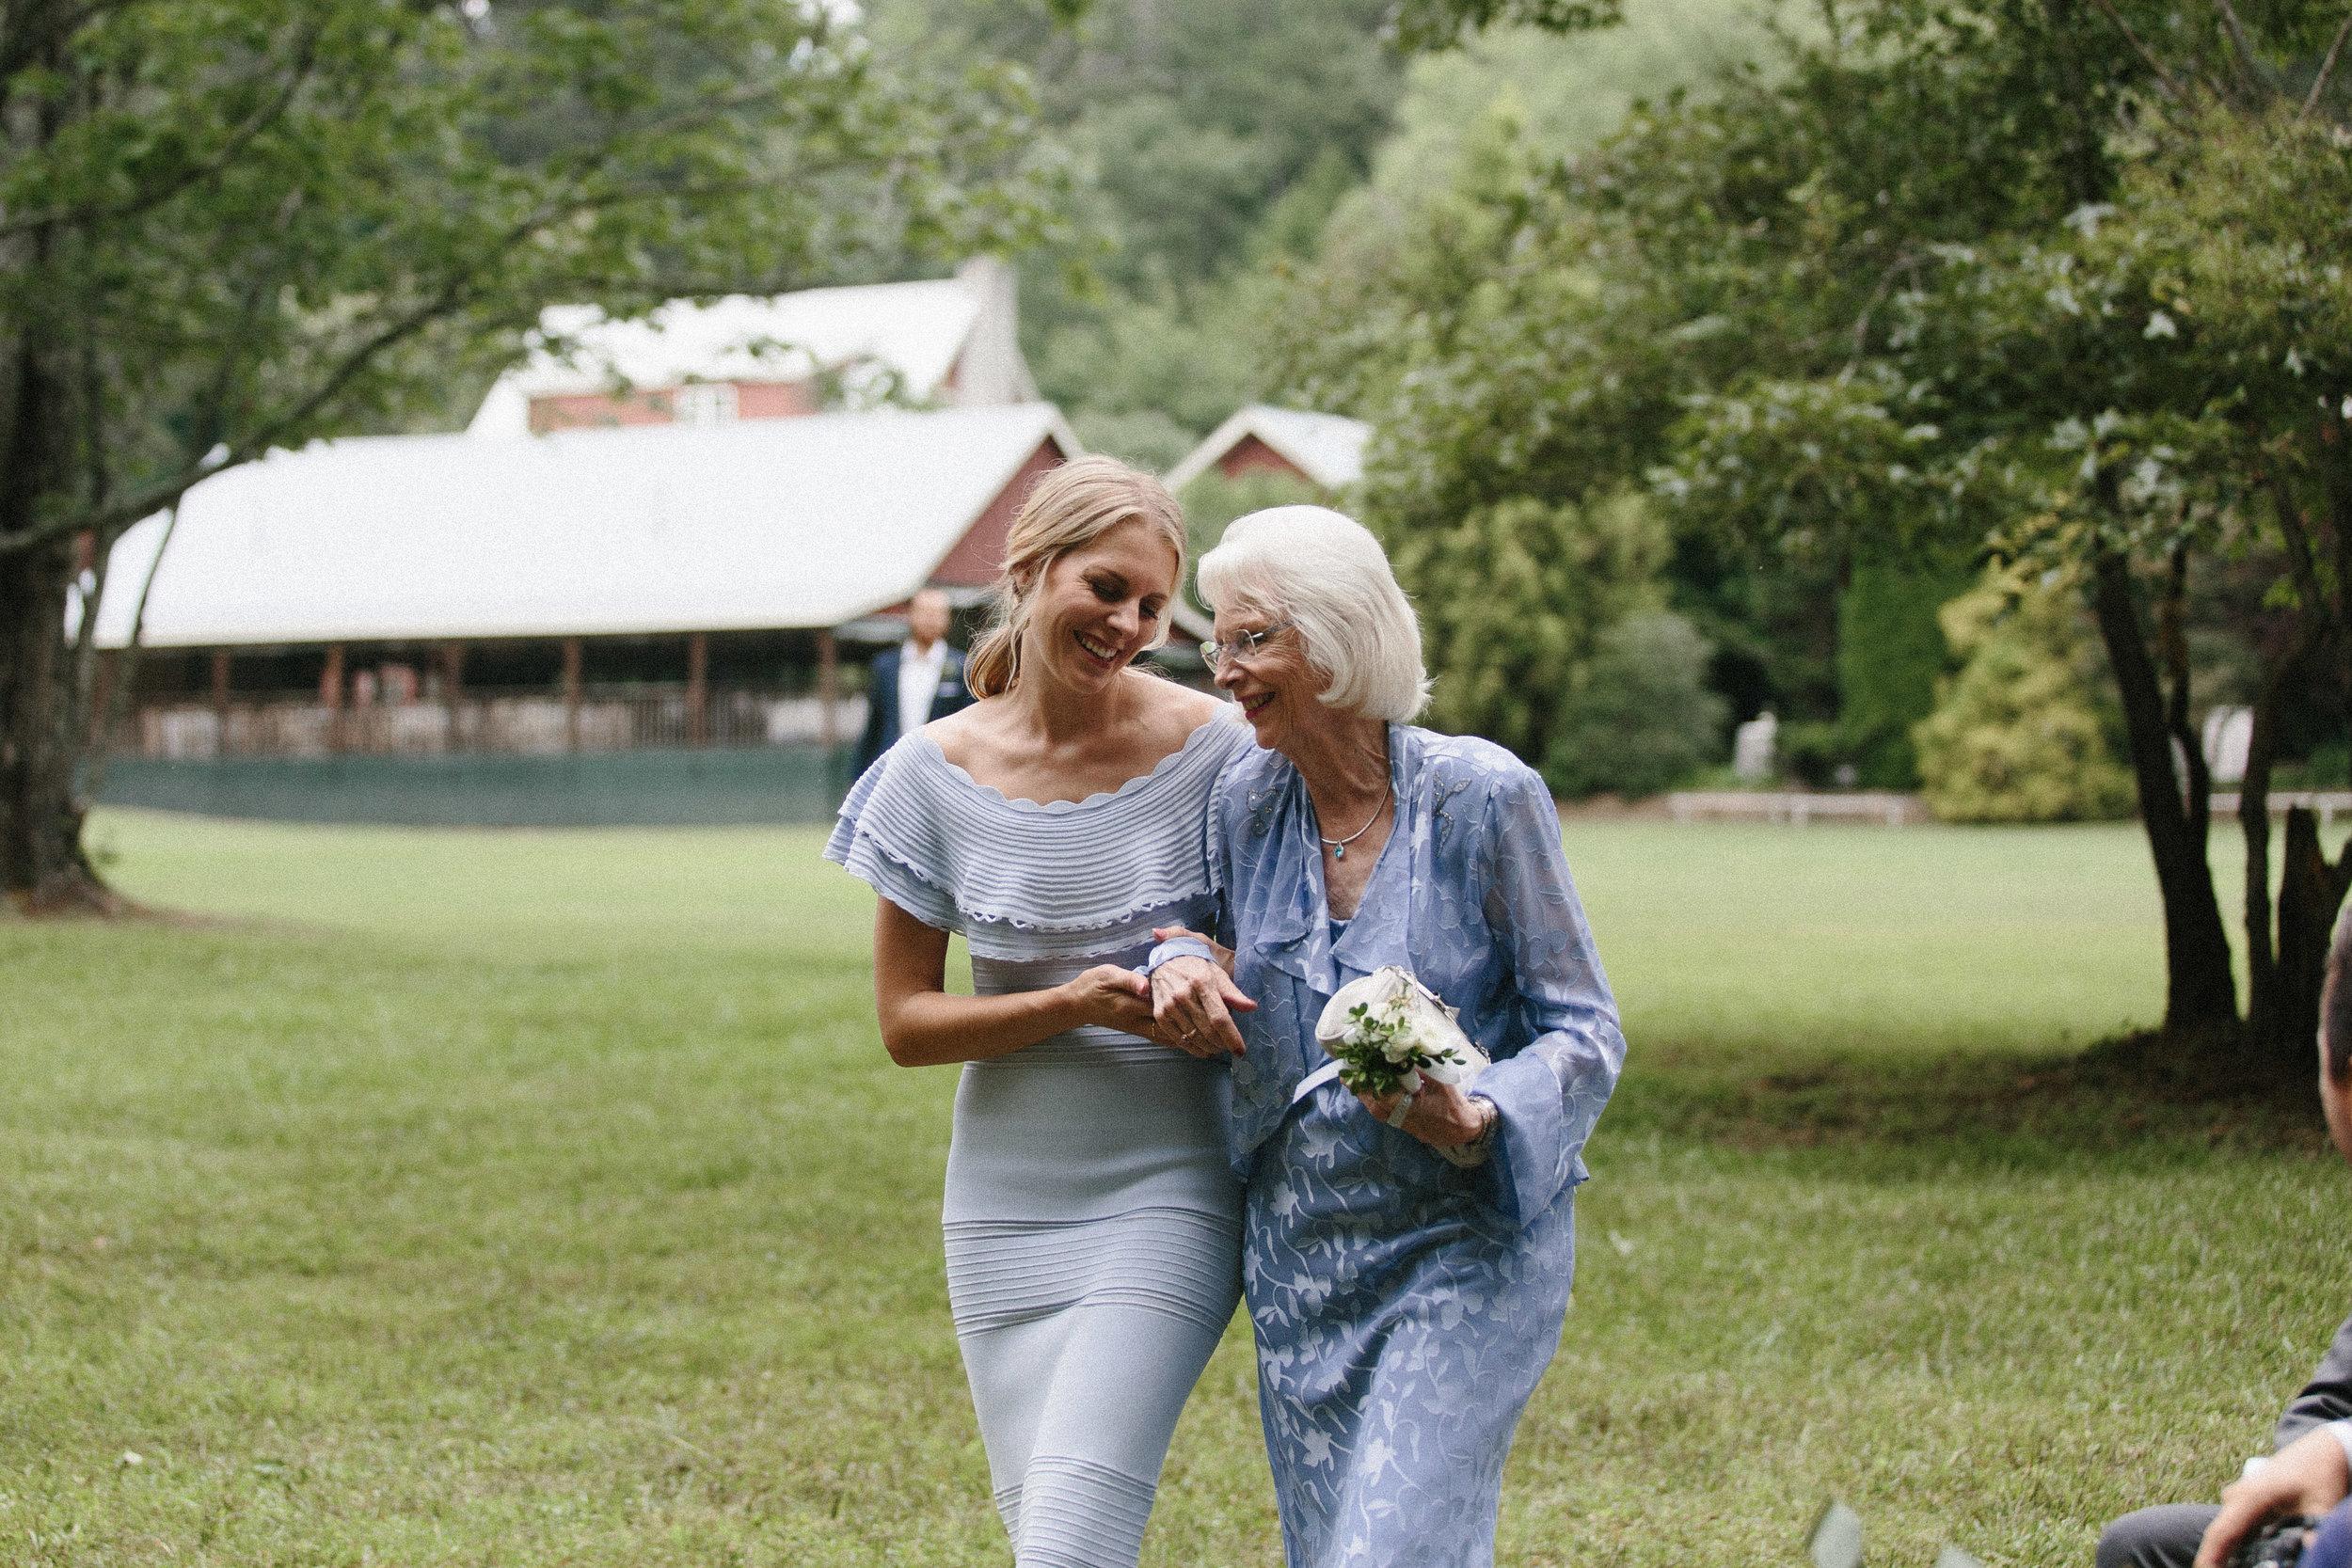 glen_ella_meadow_creekside_atlanta_wedding_photographers_1658.jpg